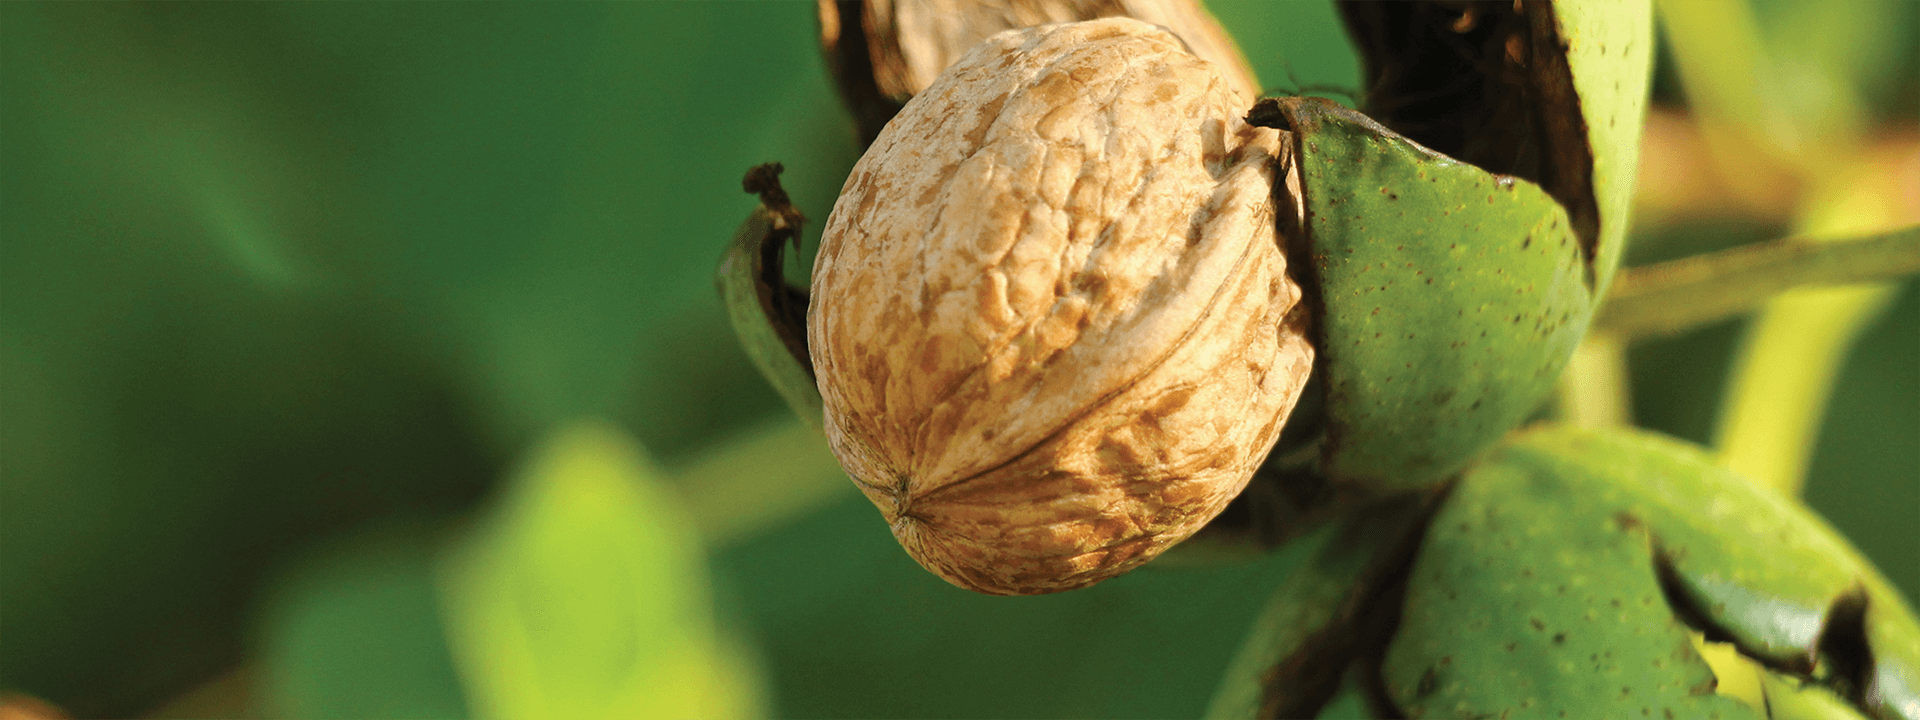 Nut Irrigation Solutions